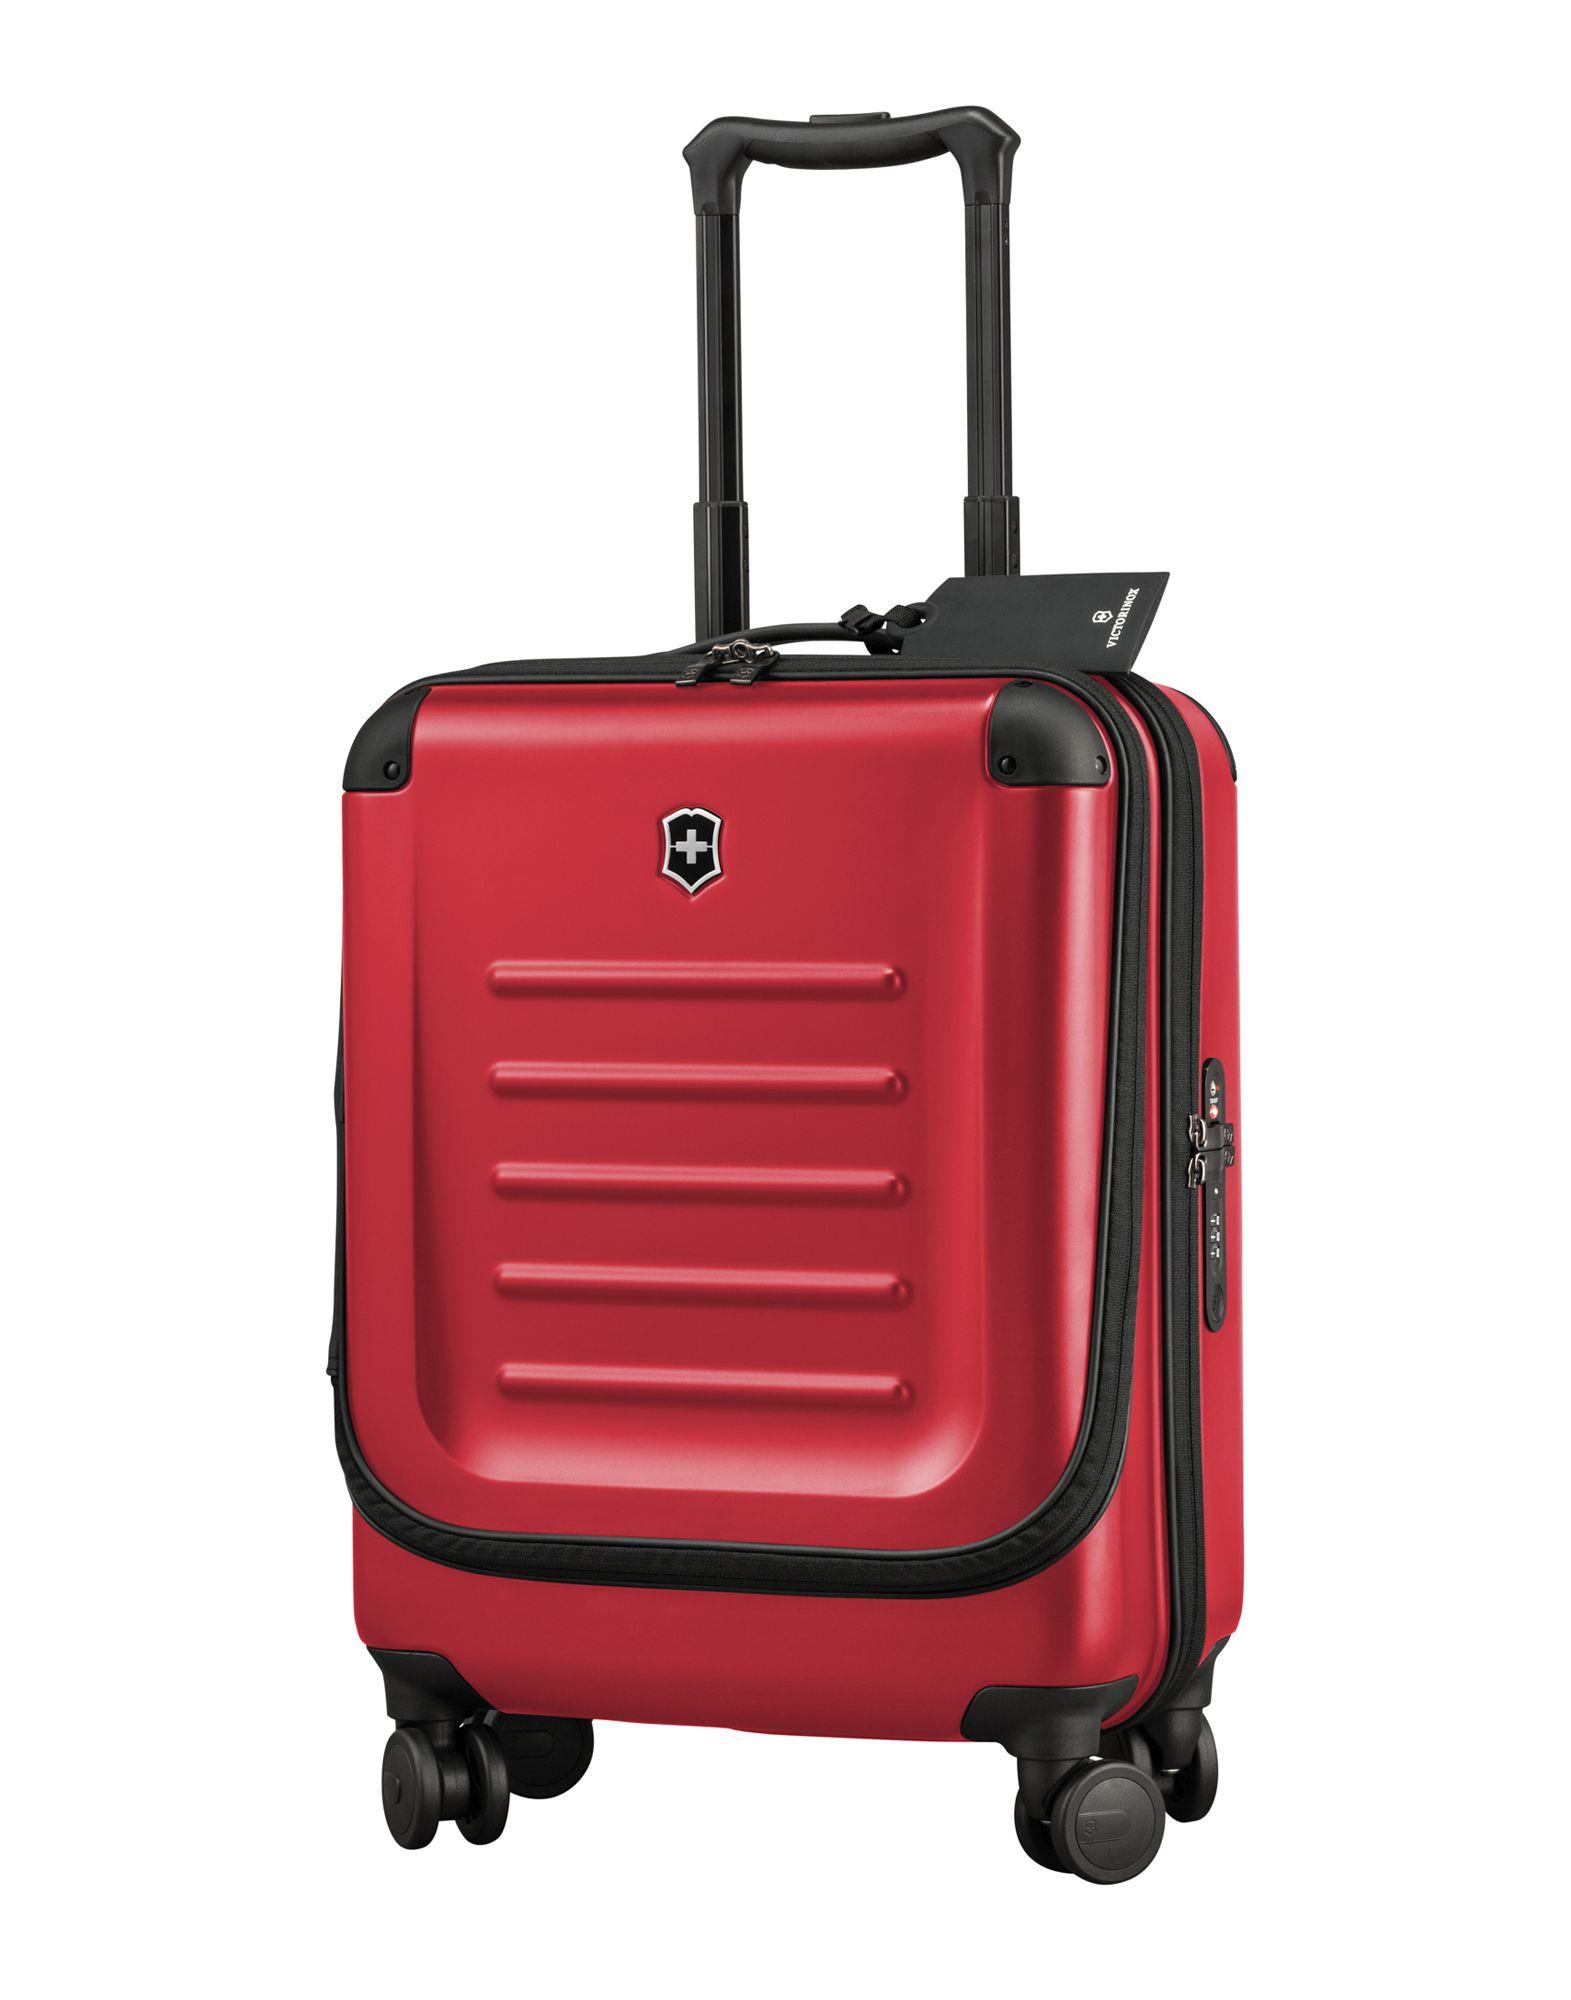 VICTORINOX Чемодан/сумка на колесиках чемодан decathlon 8245232 20 24 28 newfeel